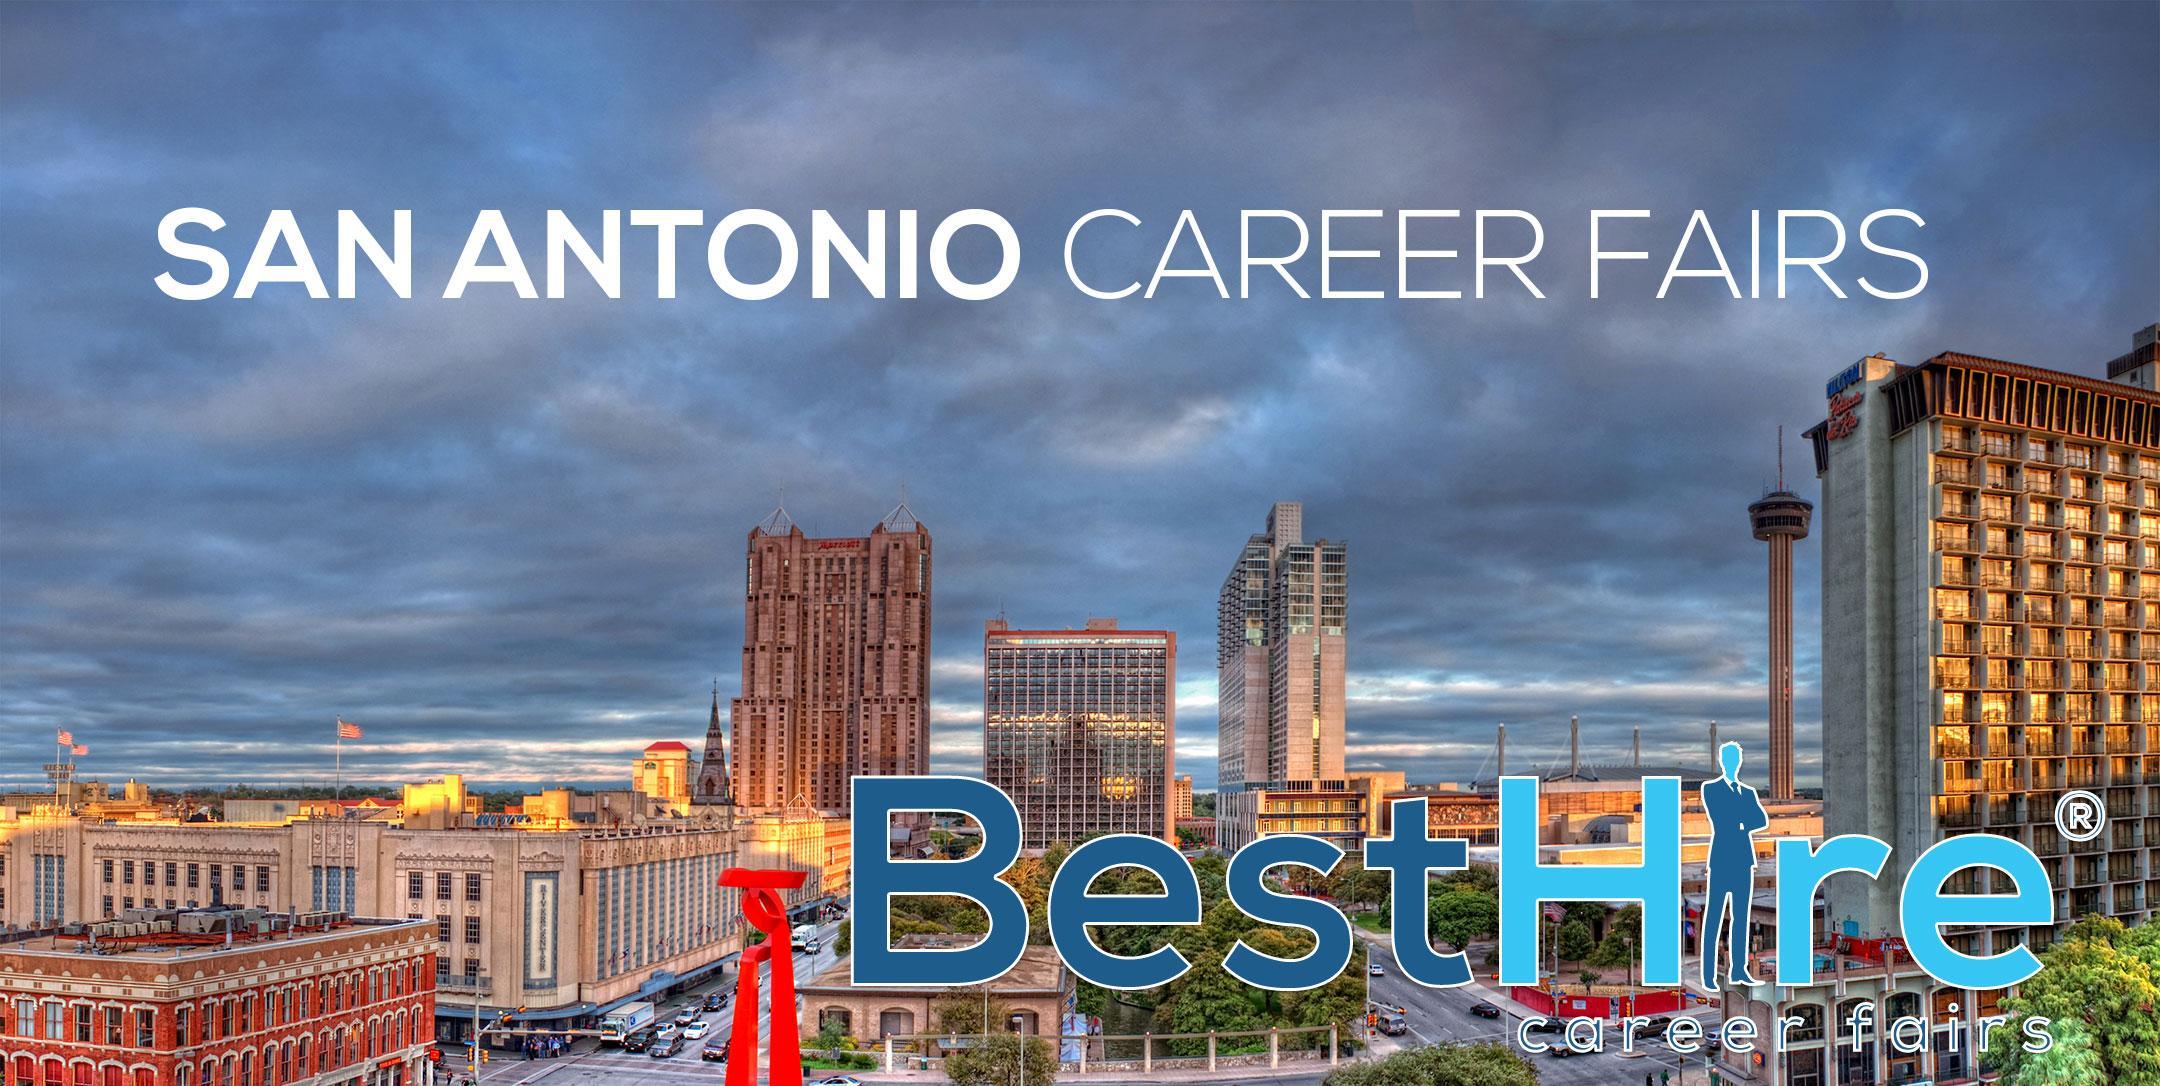 San Antonio Career Fair July 6, 2017 - Job Fairs & Hiring Events in San Antonio TX